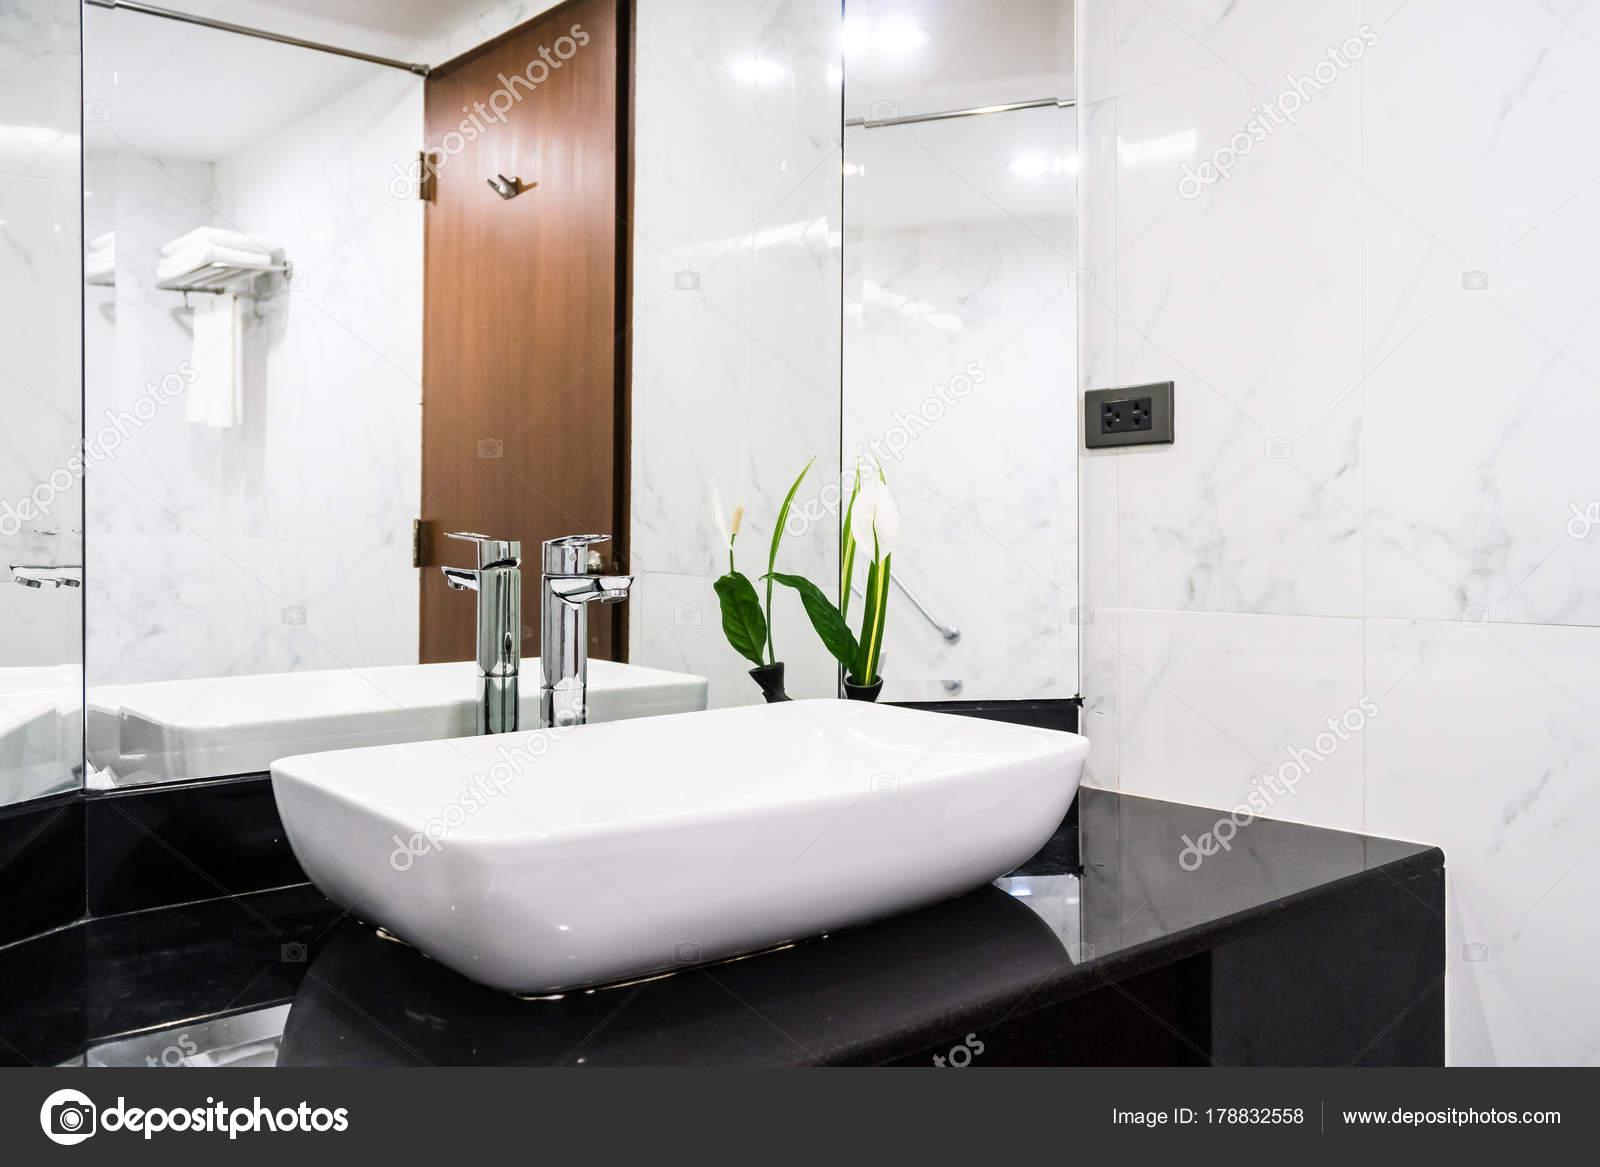 Wastafel kraan decoratie badkamer interieur u2014 stockfoto © mrsiraphol